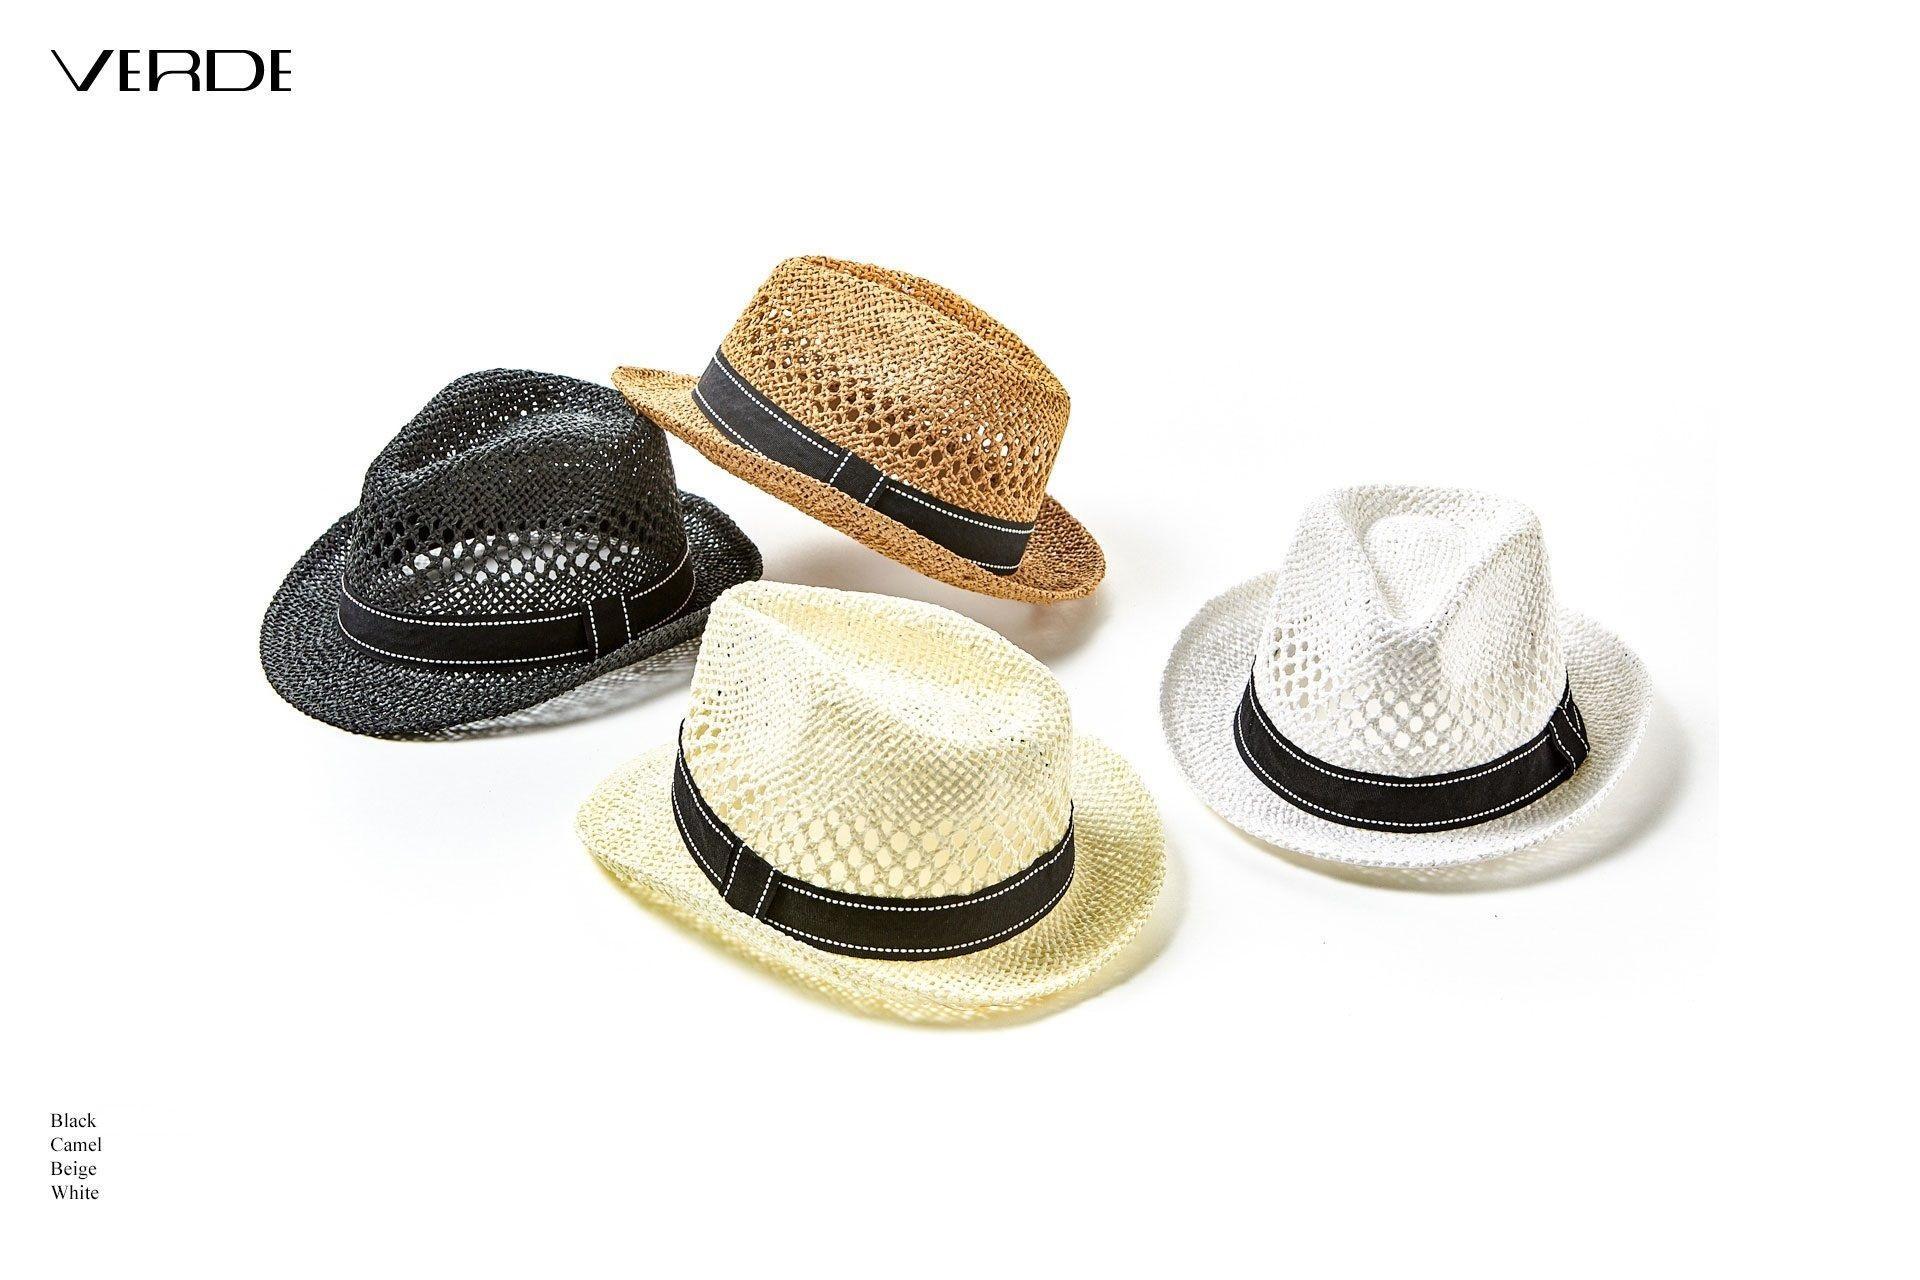 Small-brimmed hat. Women's summer hats online